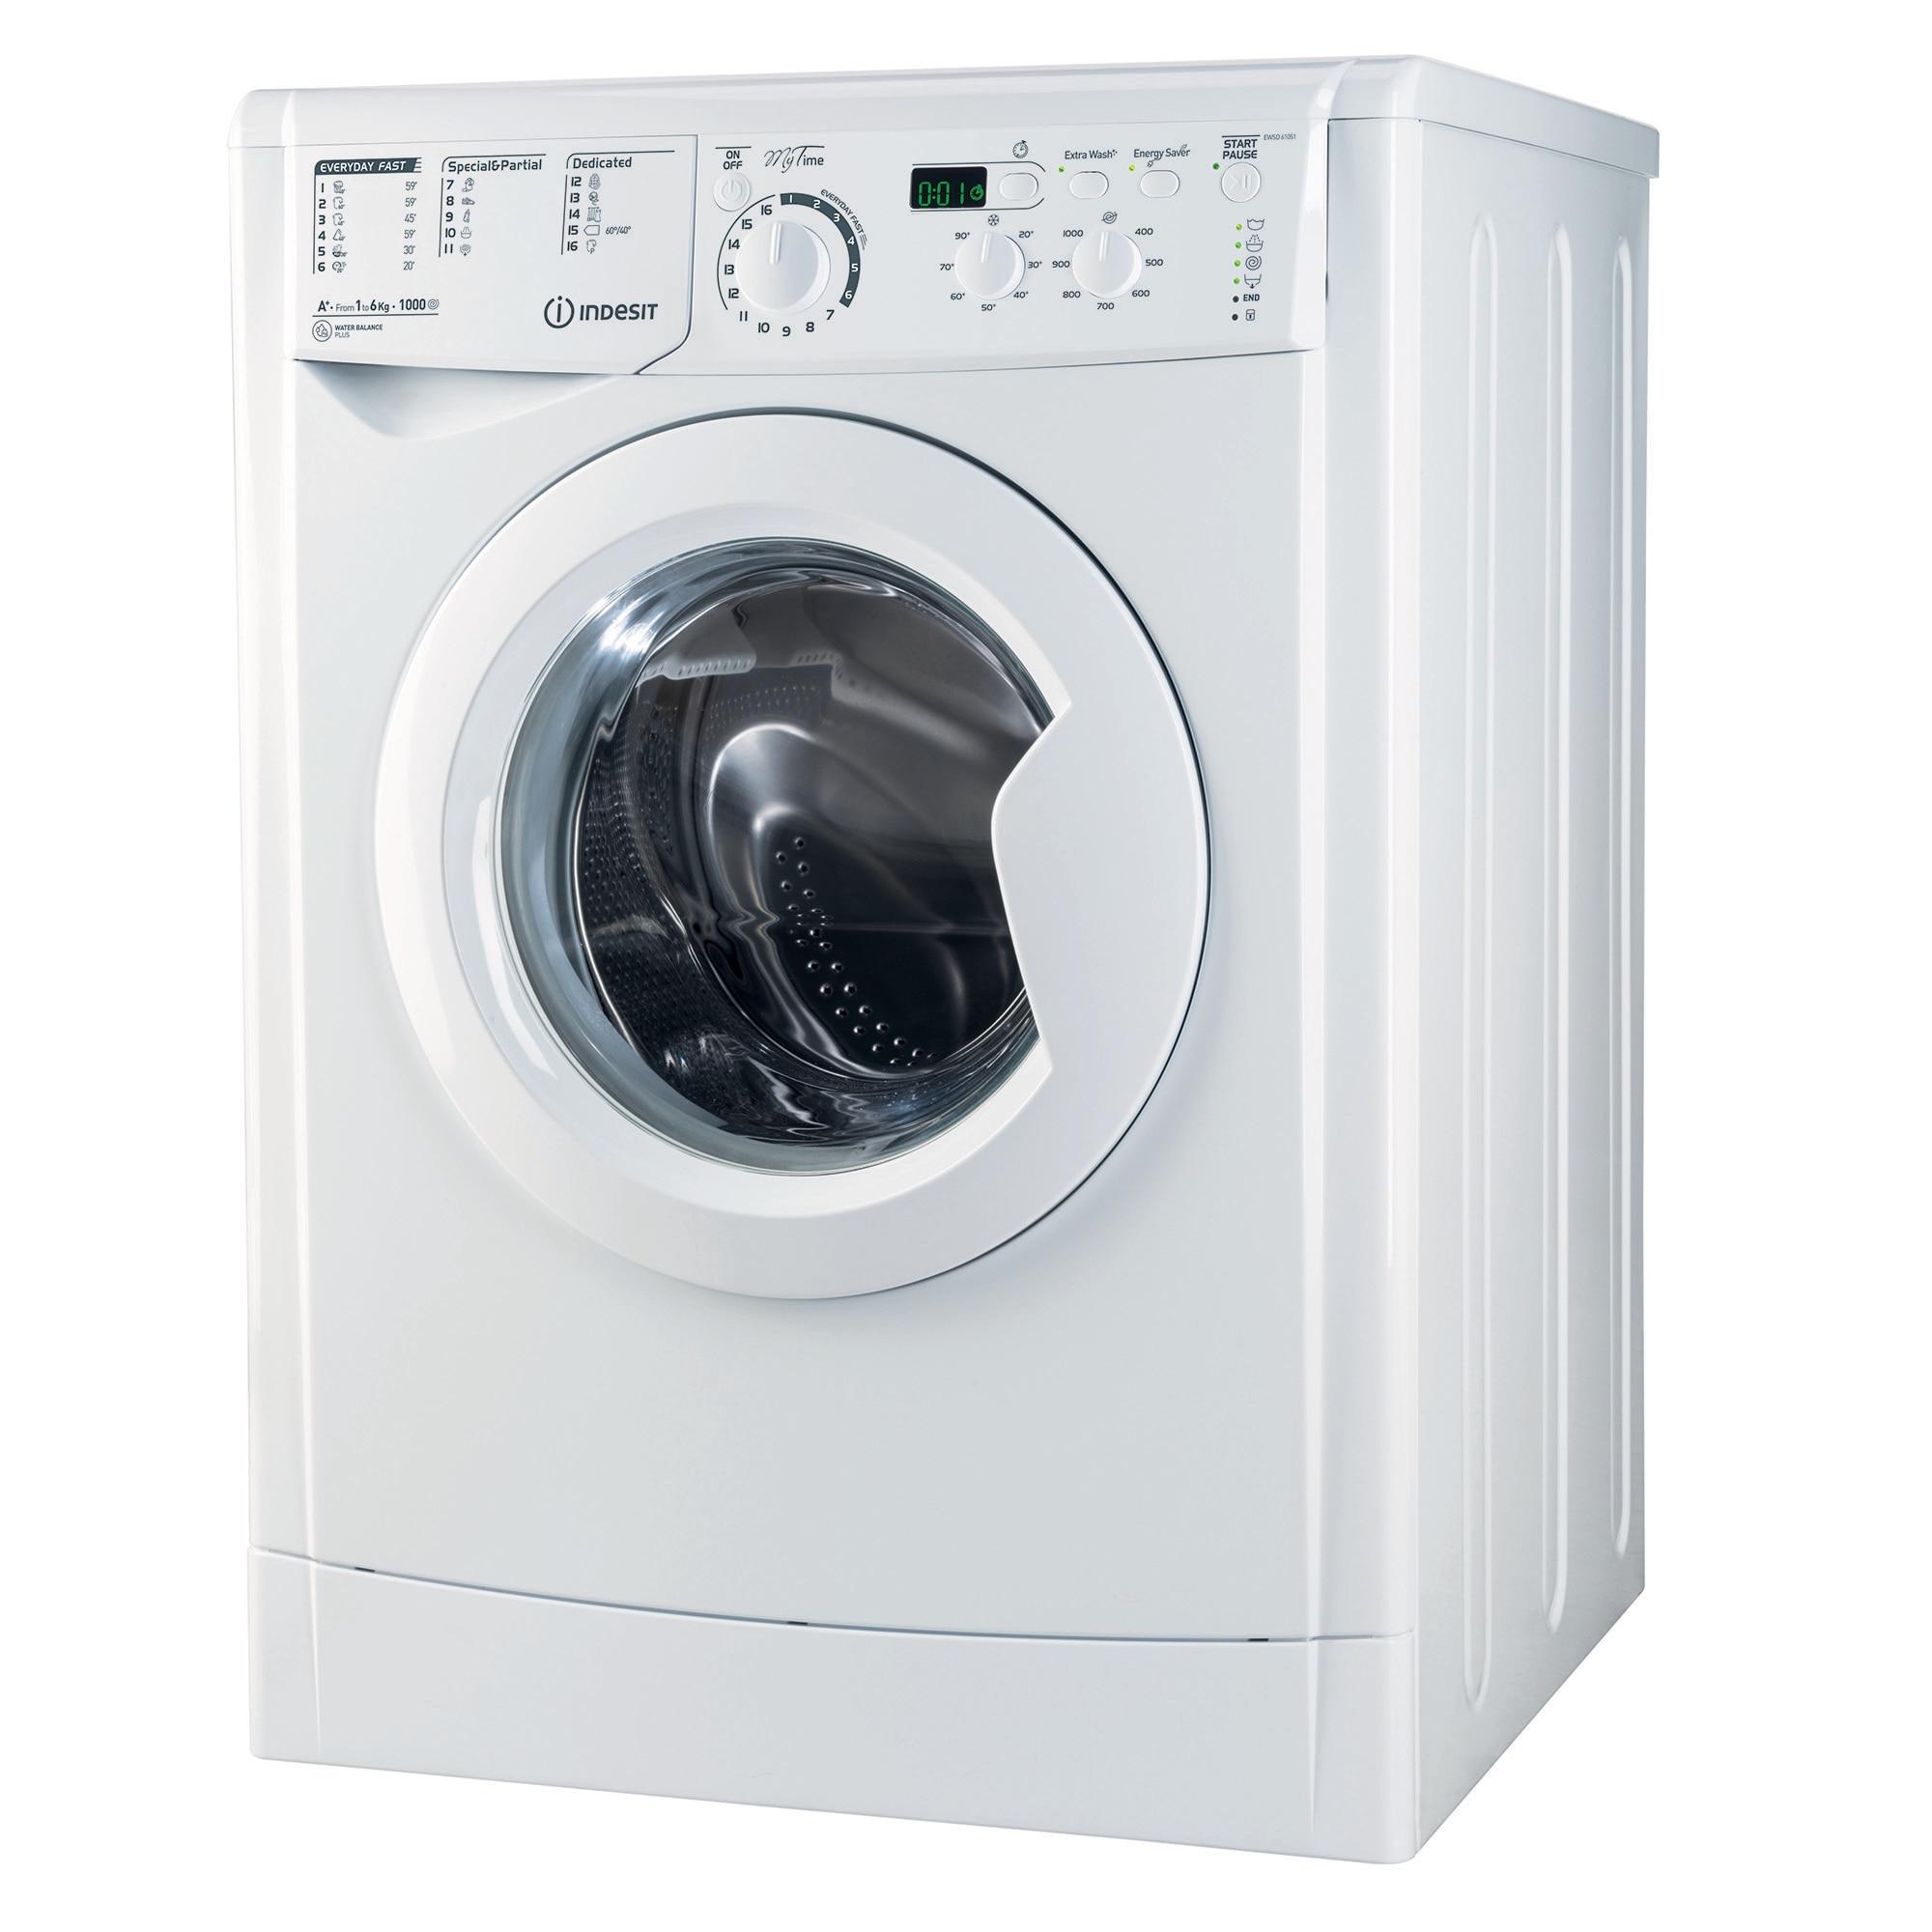 Fotografie Masina de spalat rufe slim Indesit EWSD 61051 W EU, 6 KG, 1000 rpm, Clasa A+, Alb